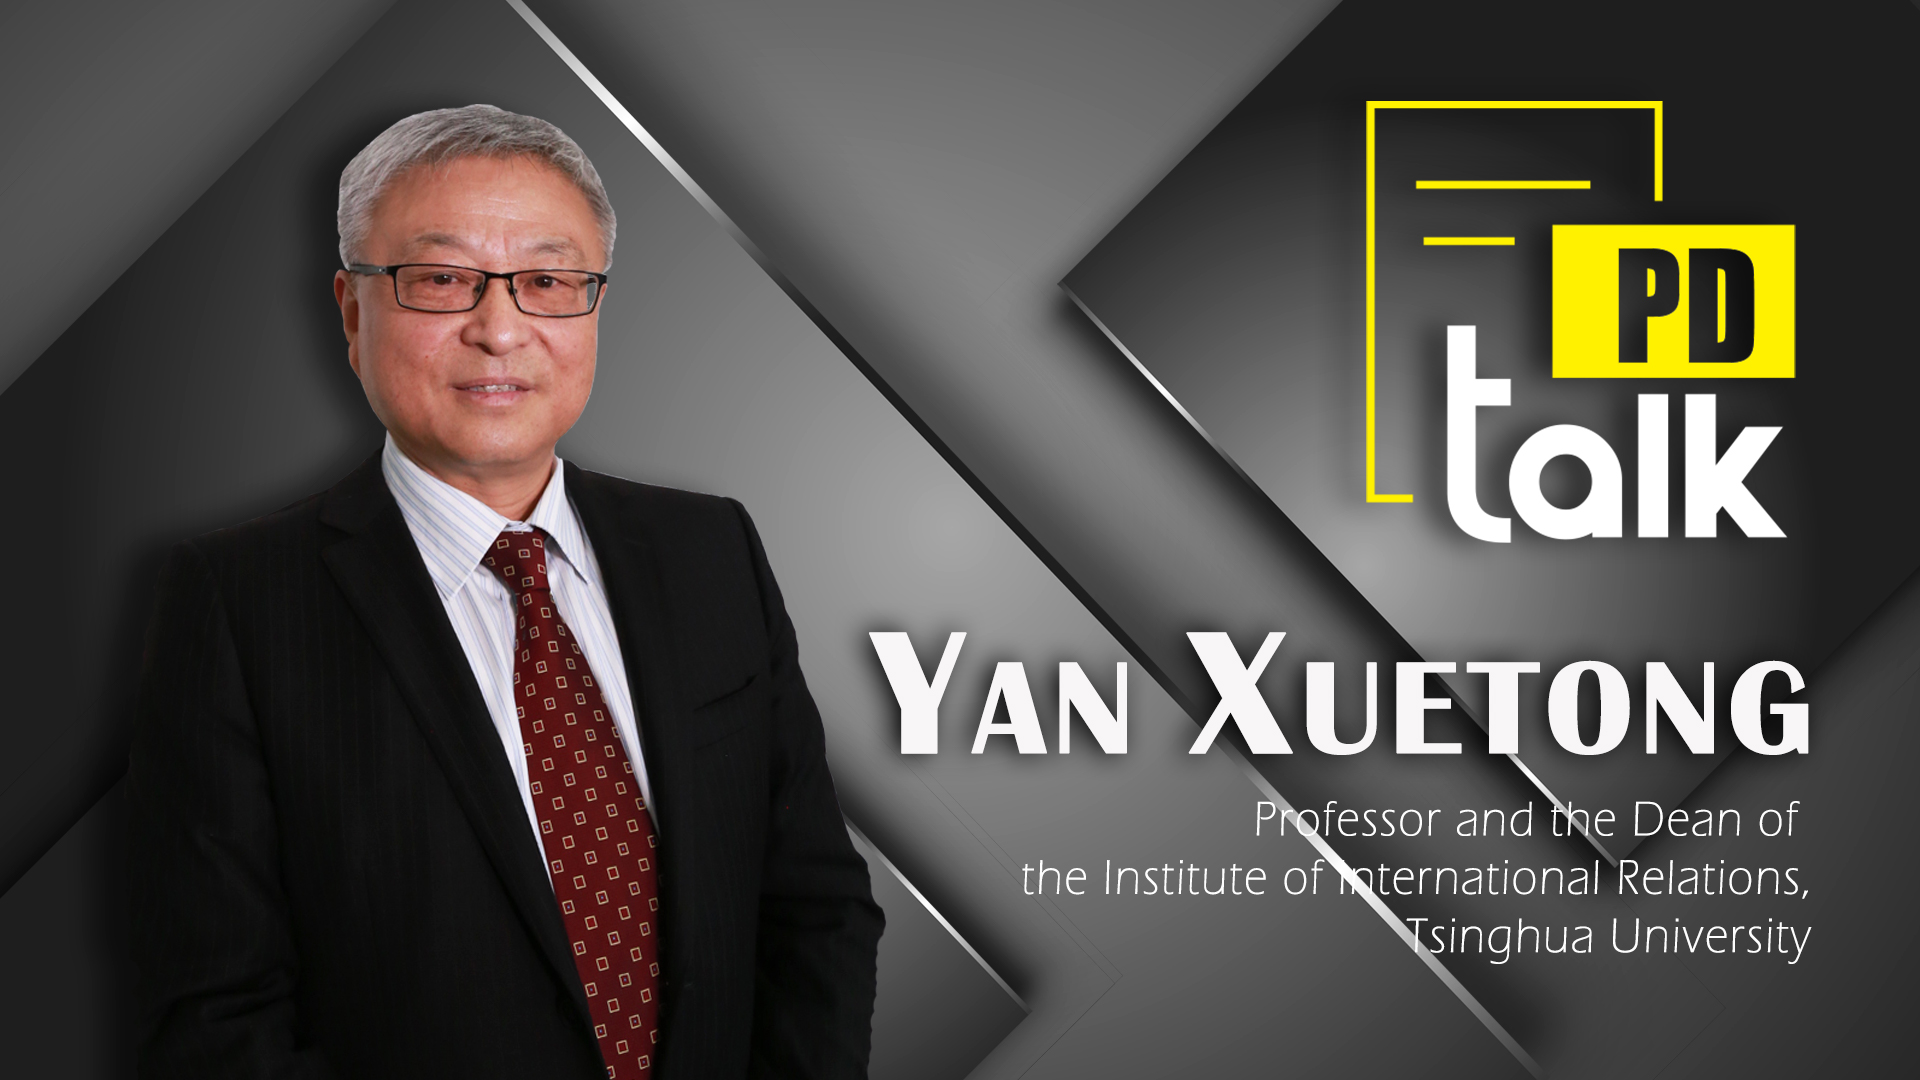 PD Talk | China's rise already reshaping international order: Yan Xuetong (I)